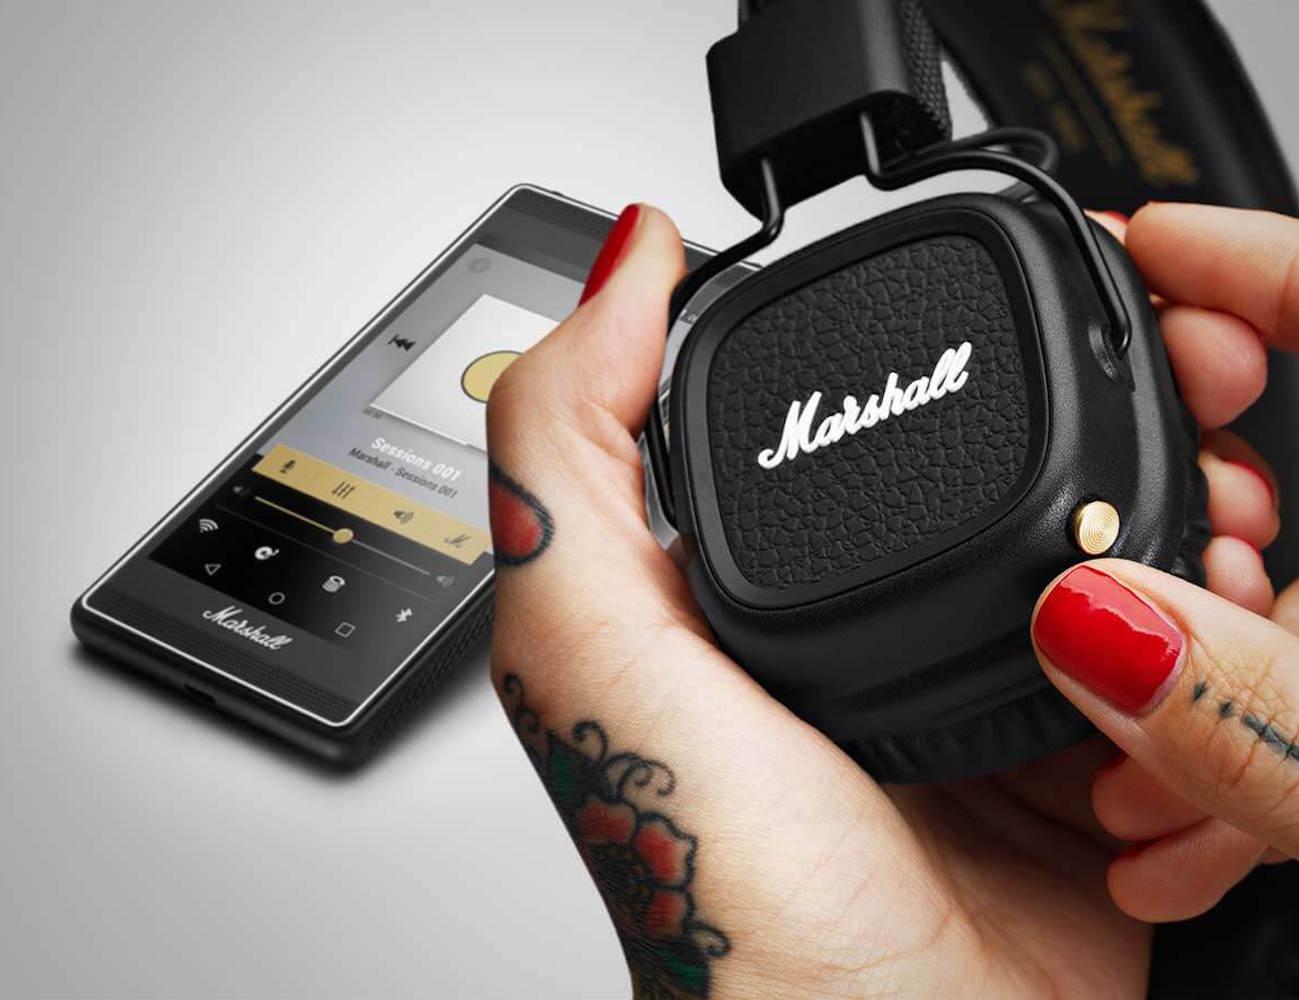 major ii bluetooth headphones by marshall gadget flow. Black Bedroom Furniture Sets. Home Design Ideas